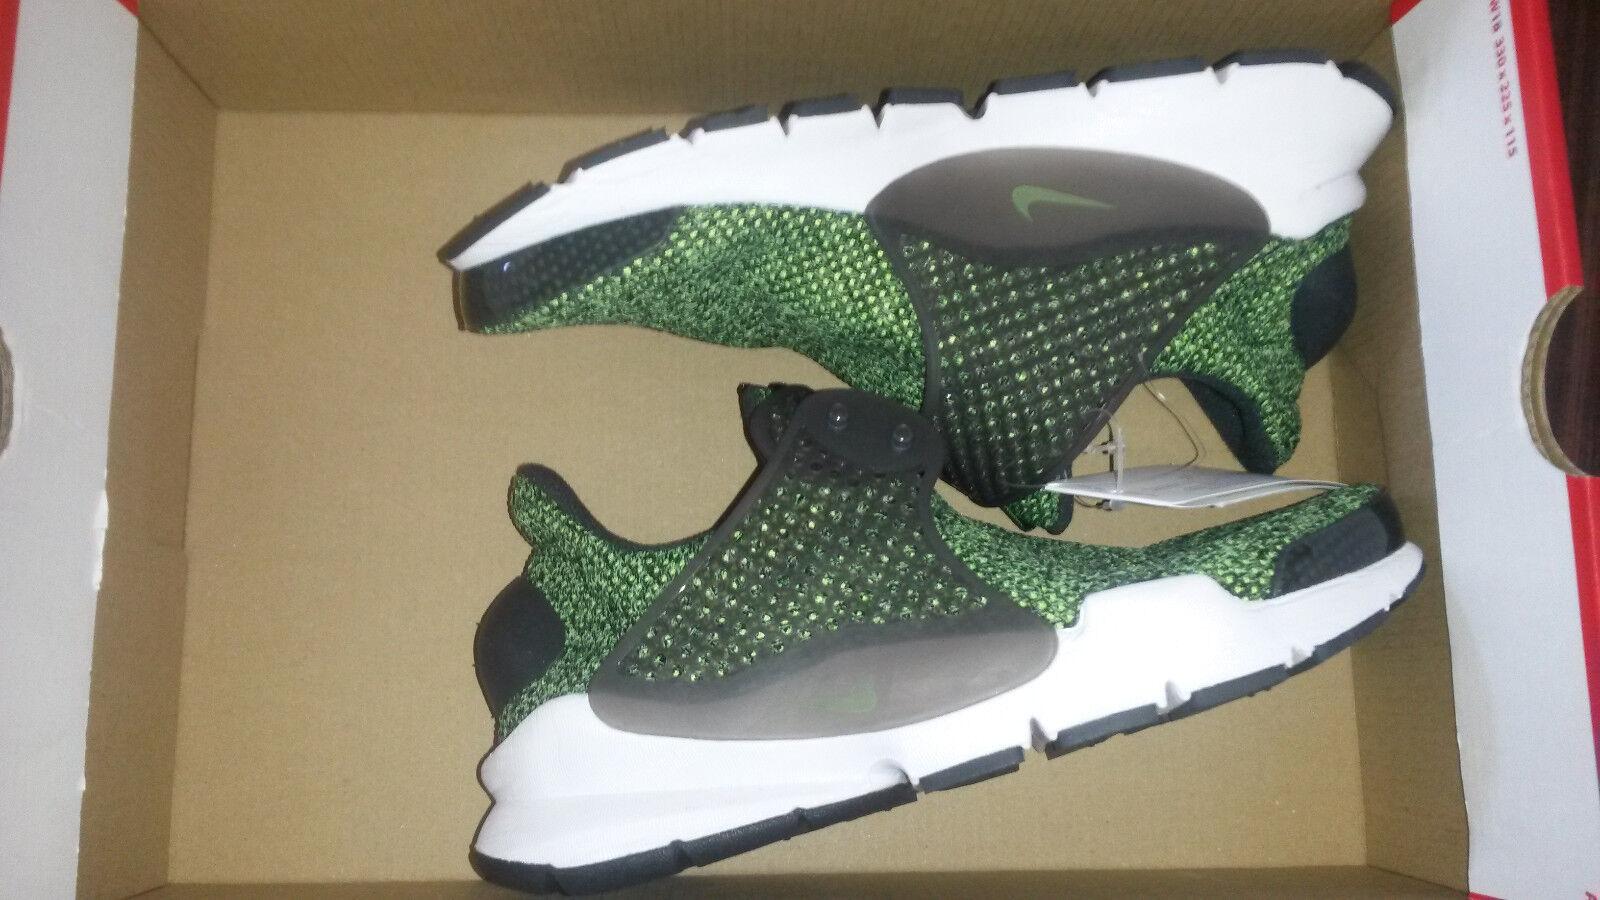 Nike Sock Dart SE GS Big Kids Sneakers Shoes Neu Grün Schuhe 917951-002 Gr.36